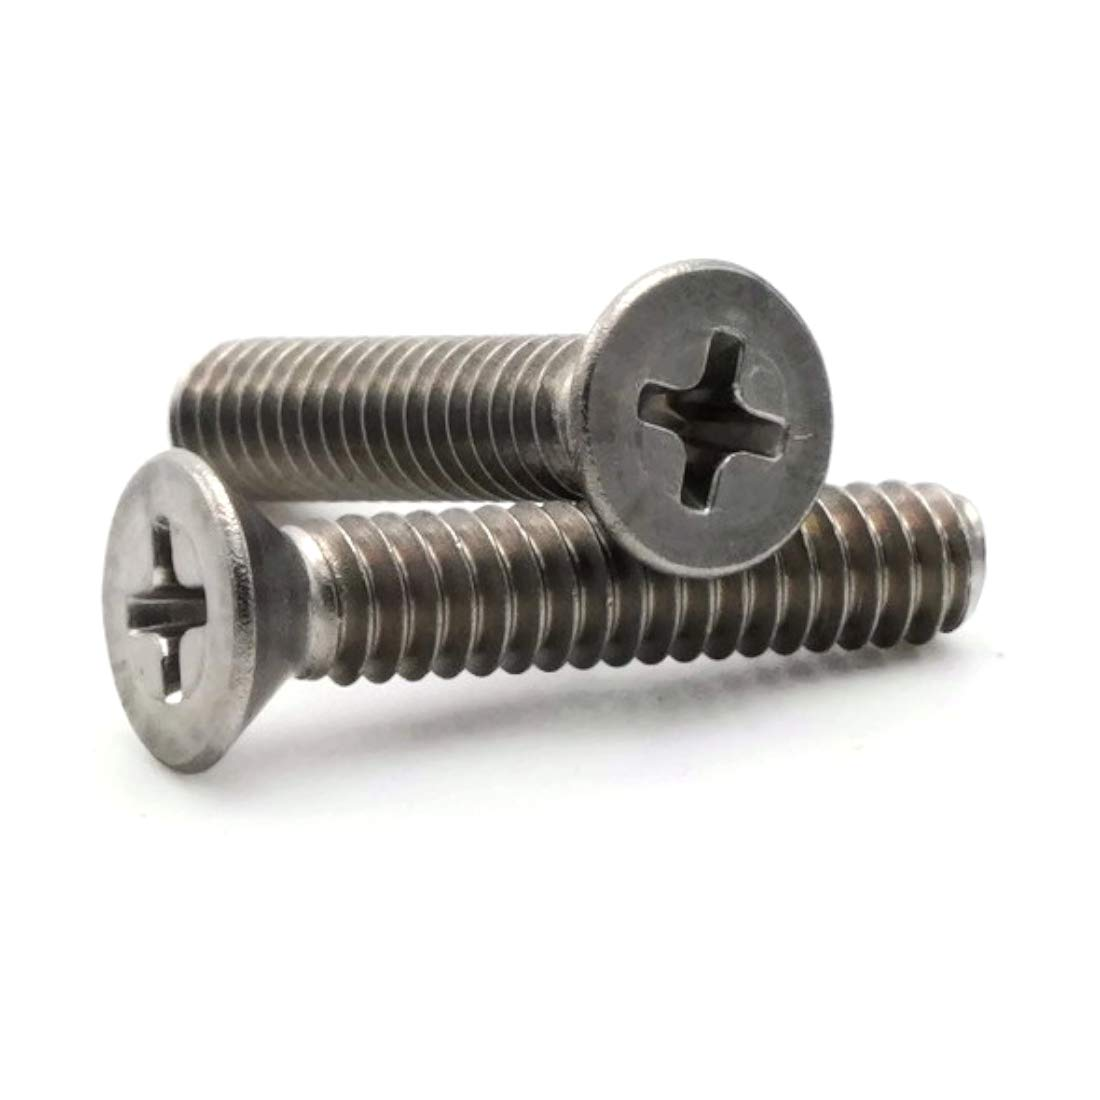 Phillips Flat Head Machine Screw 18-8 Stainless Steel 3//8-16 x 1-1//4 Qty-25